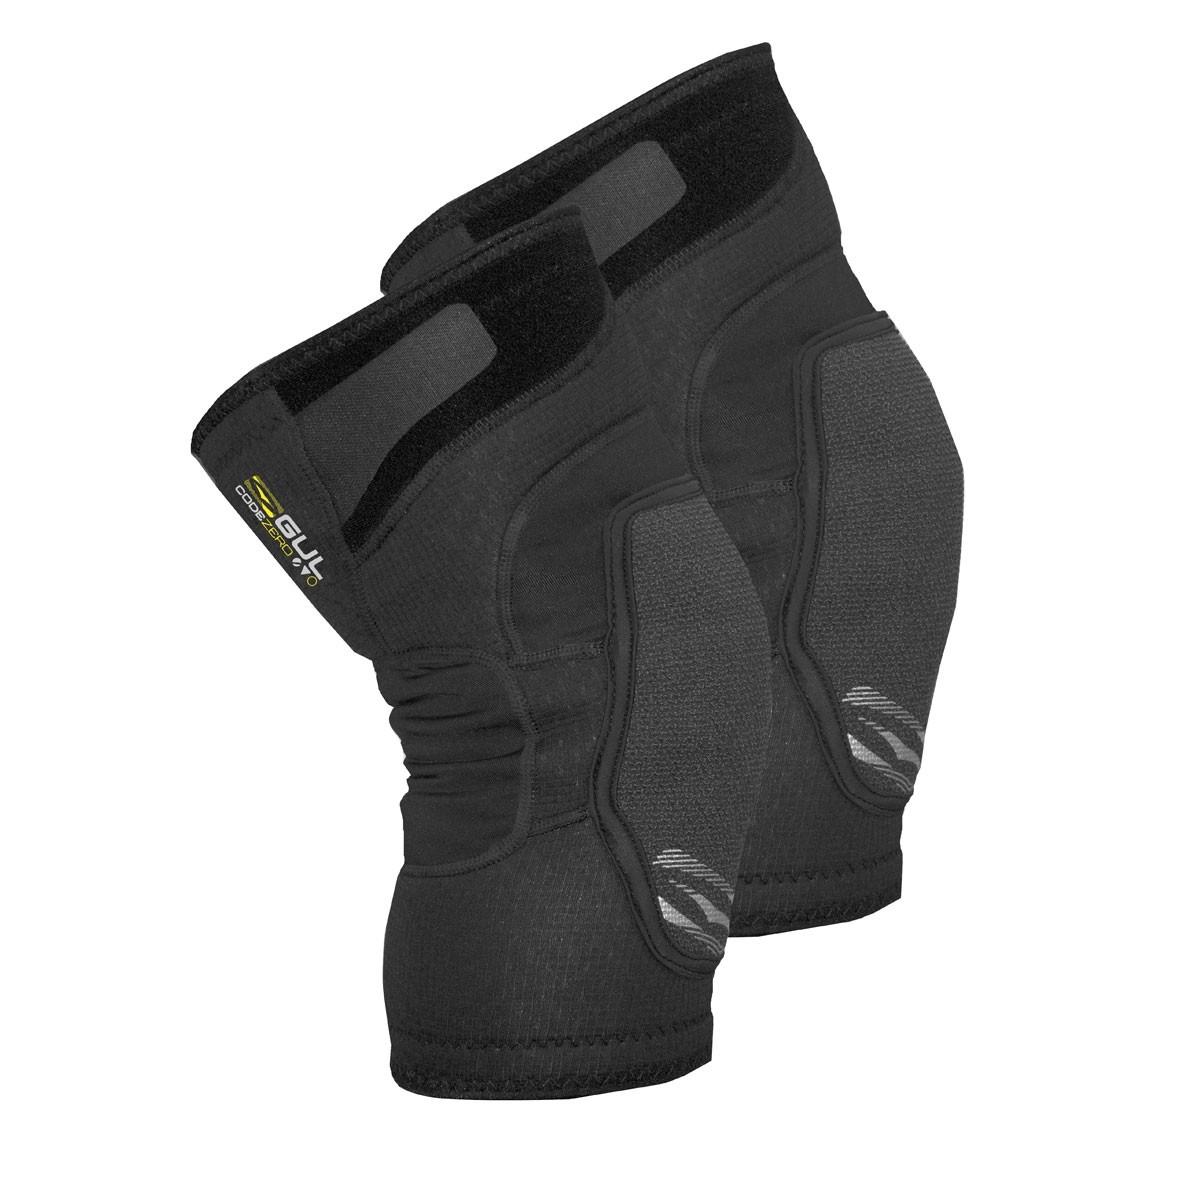 chrániče kolen a neoprenu '18 Gul Pro D30 Knee Pads gm0362 - M